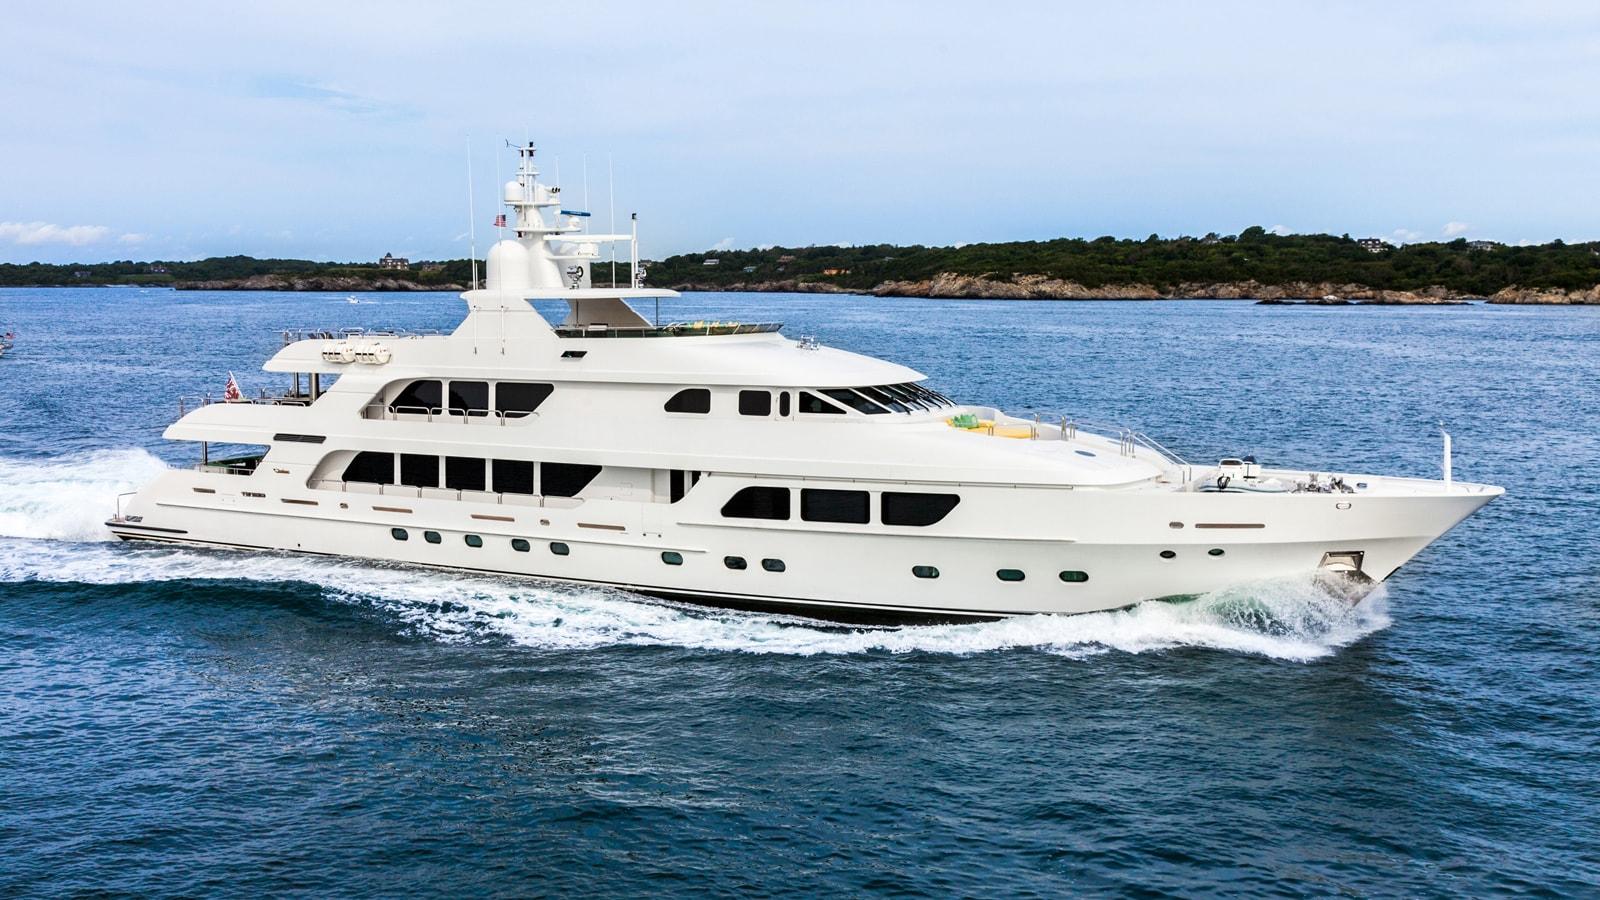 Motor Yacht: A Christensen Superyacht